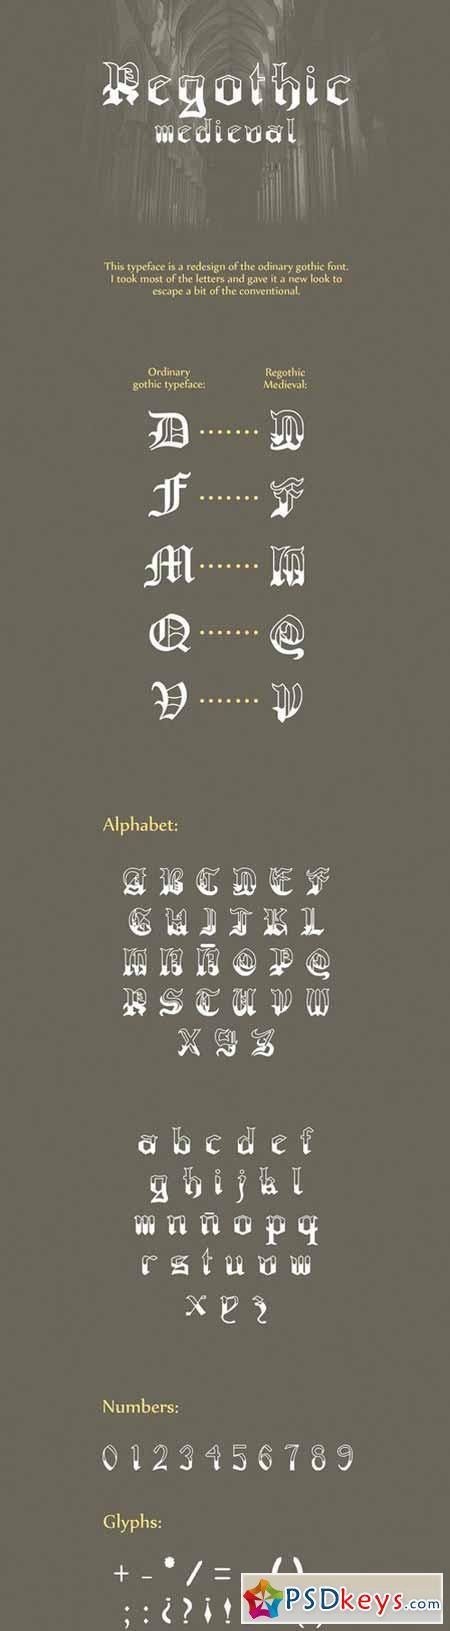 Regothic medieval Typeface